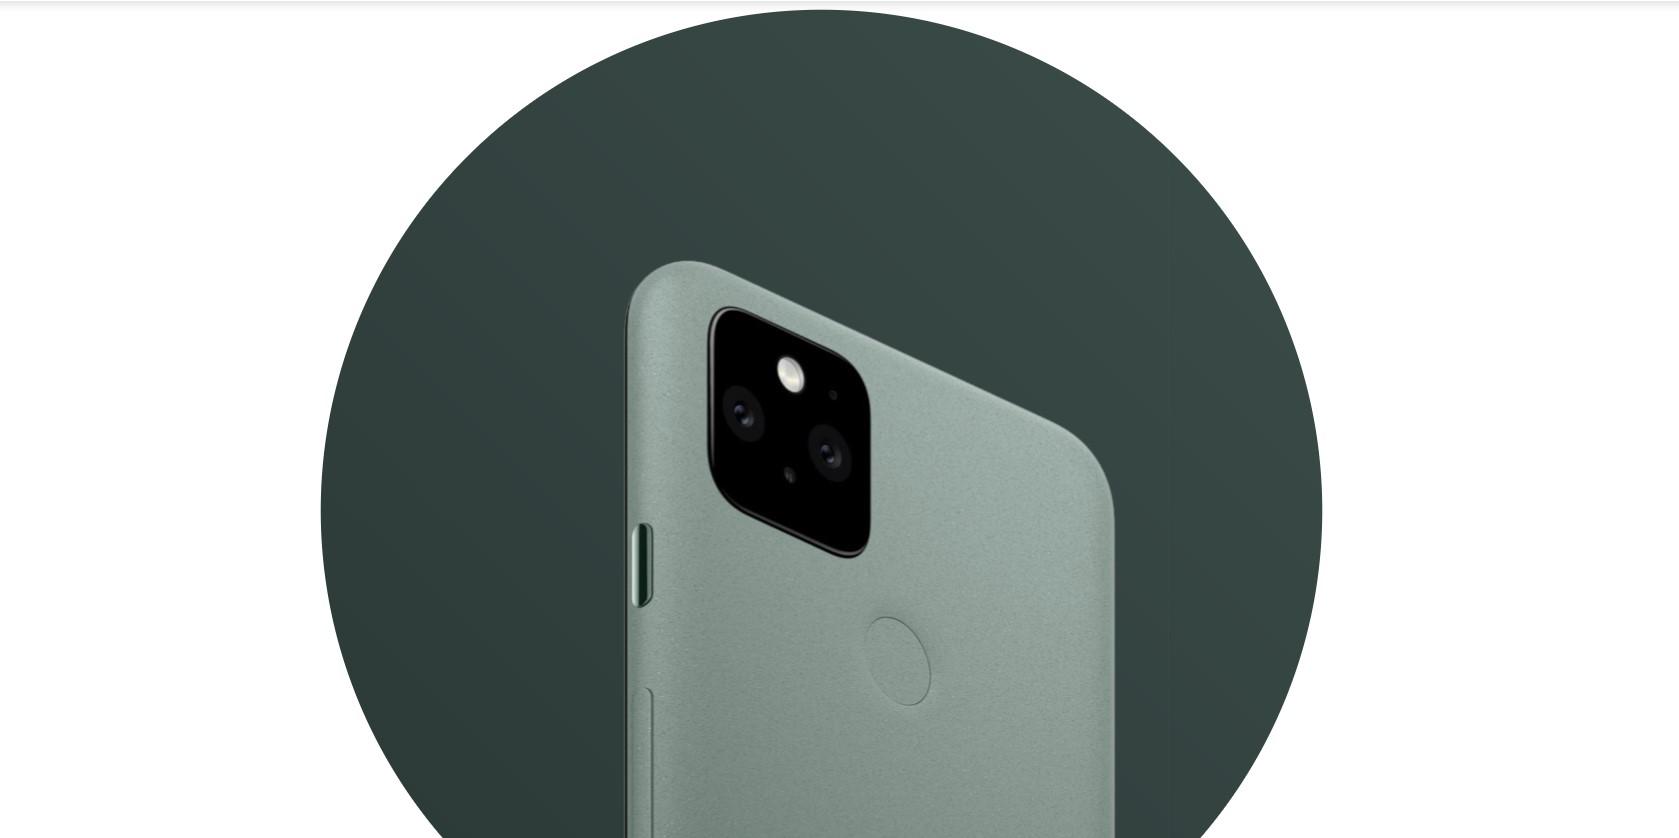 Google Camera 8.0 from Pixel 5 APK download